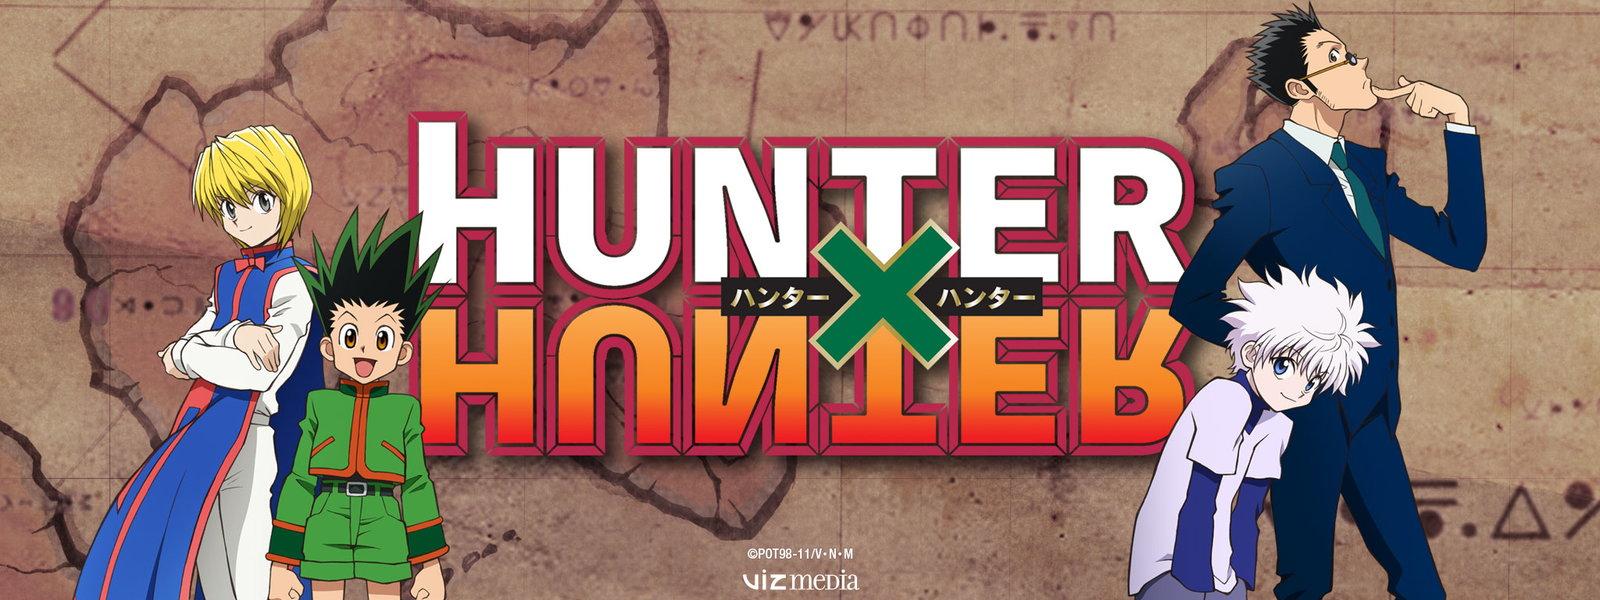 Hunter x Hunter Art Rinkya